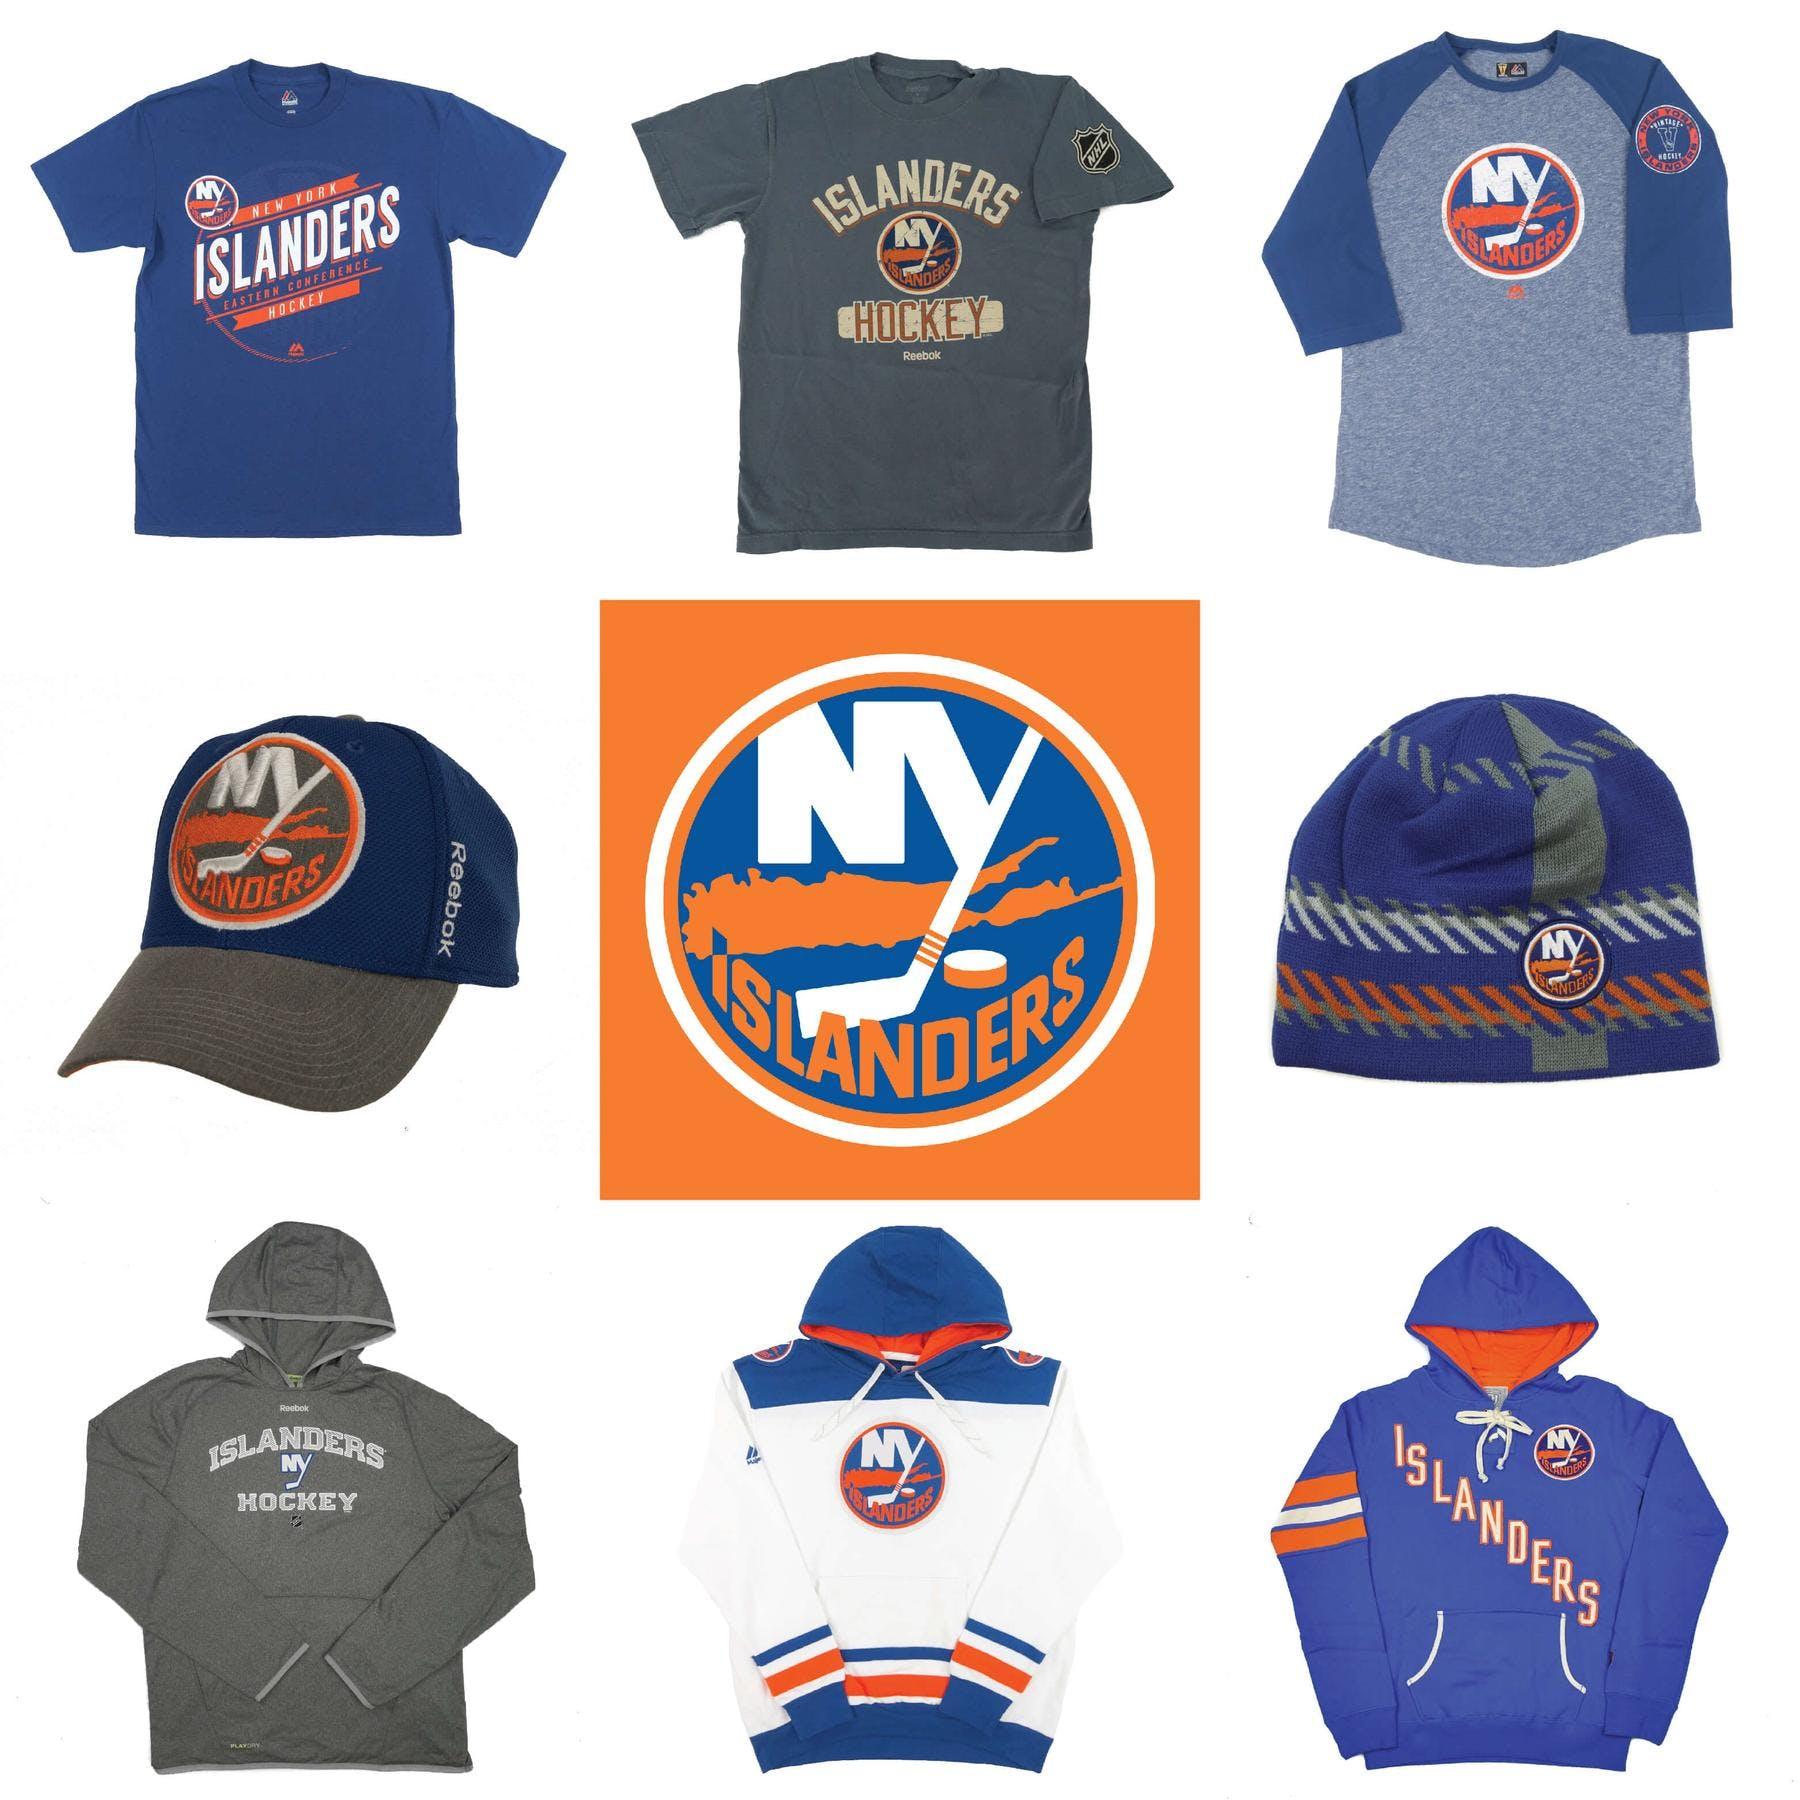 b0c2c94cd64 New York Islanders Officially Licensed NHL Apparel Liquidation - 430+  Items, $20,000+ SRP! | DA Card World